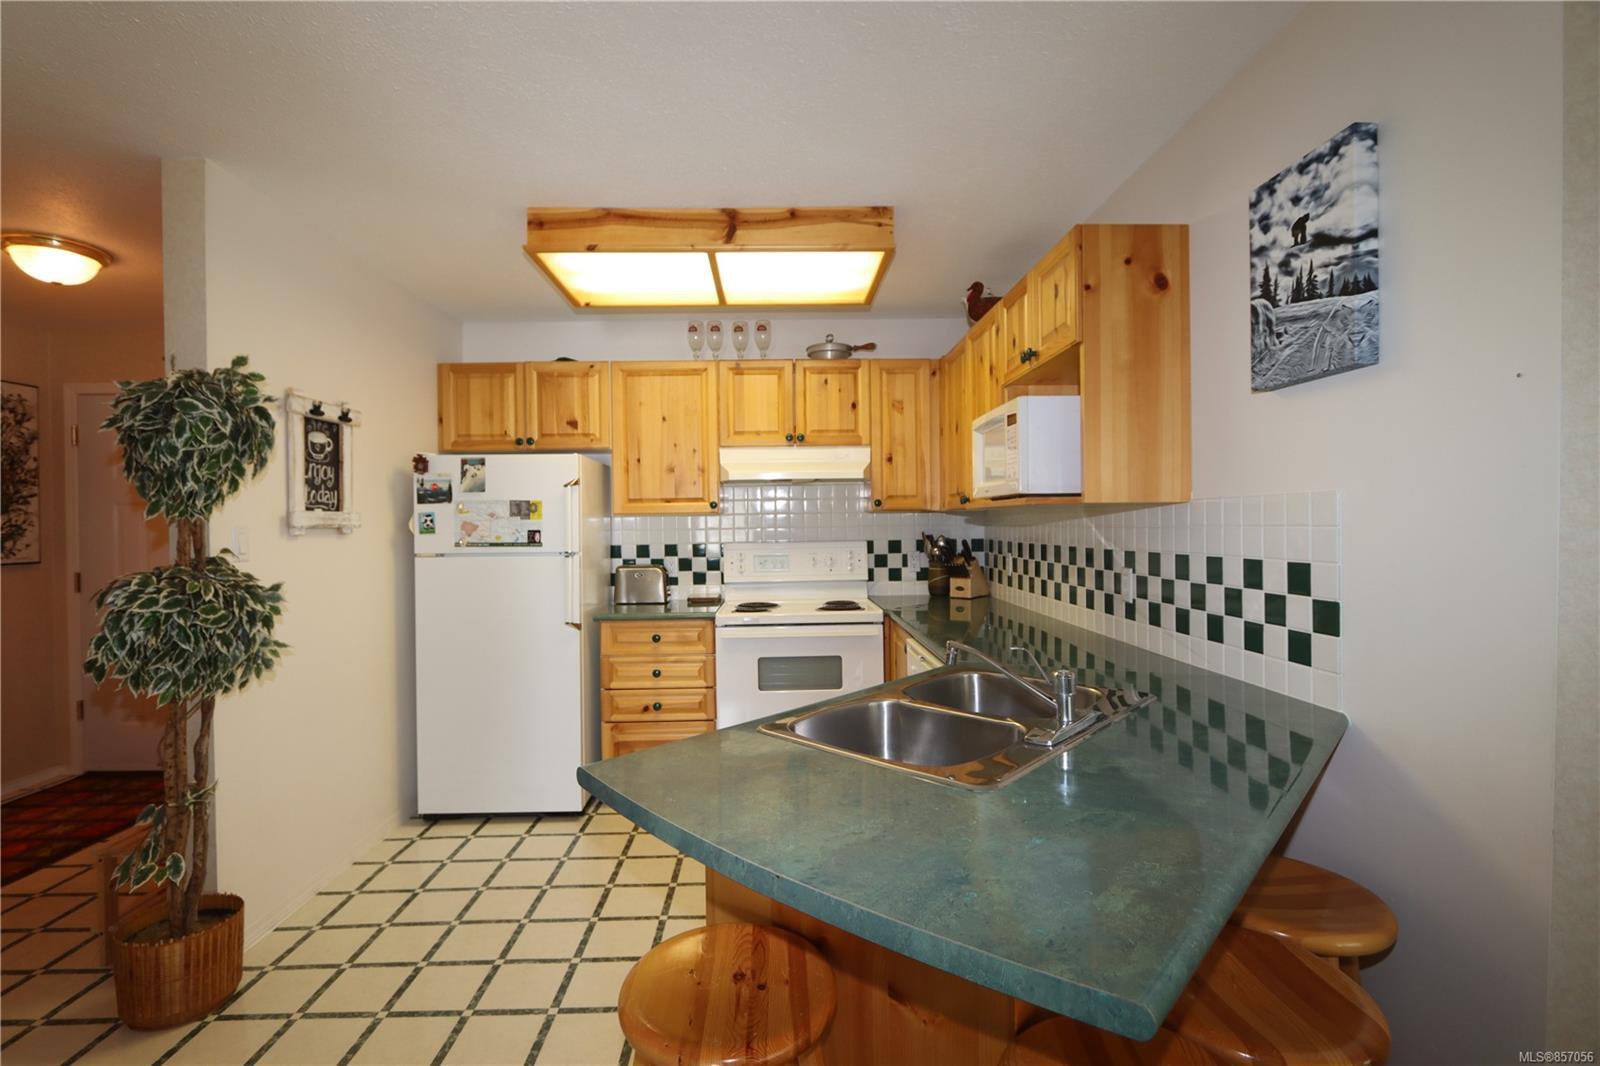 Photo 7: Photos: 118 1320 Henry Rd in : CV Mt Washington Condo for sale (Comox Valley)  : MLS®# 857056